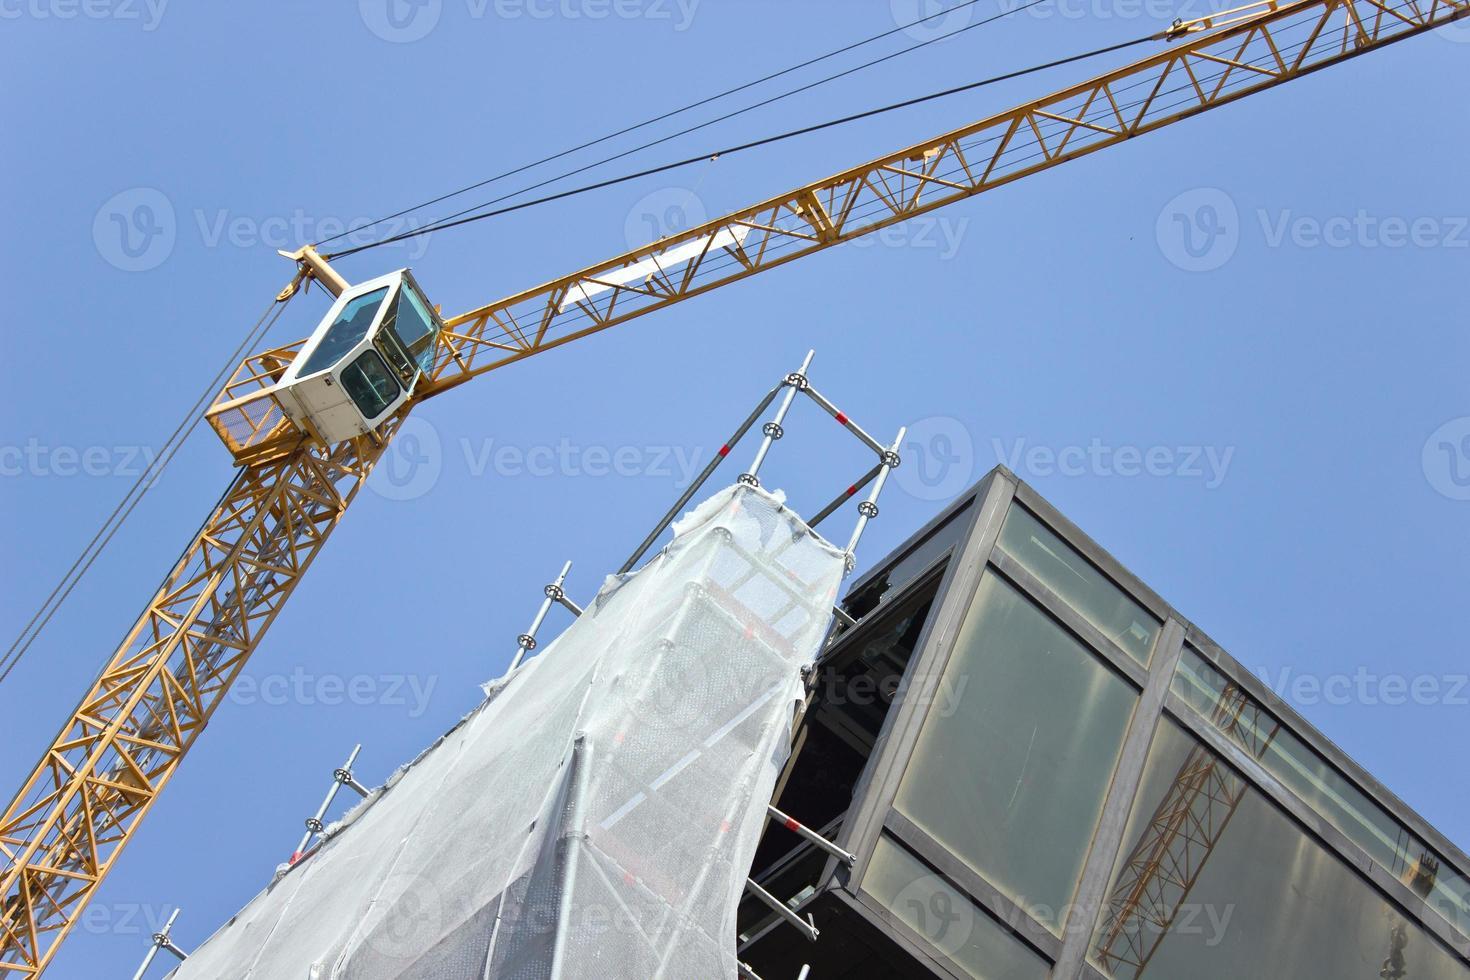 Baustelle mit Kränen gegen blauen Himmel foto